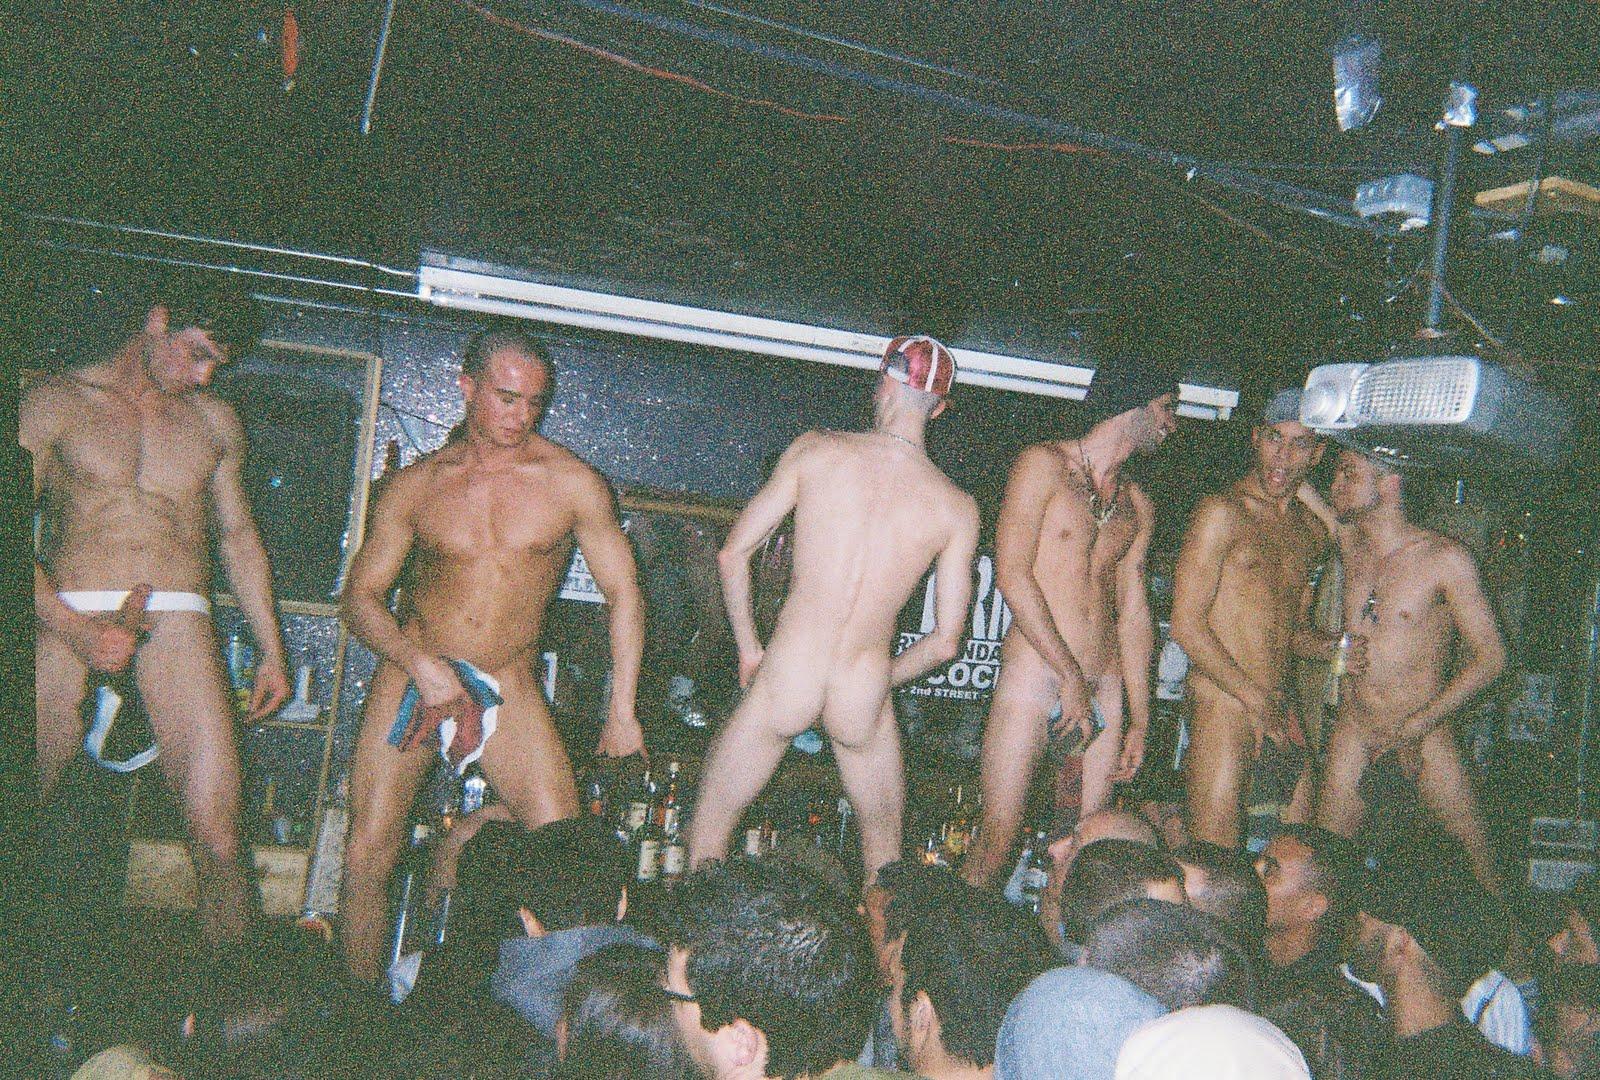 guys gone wild Naked